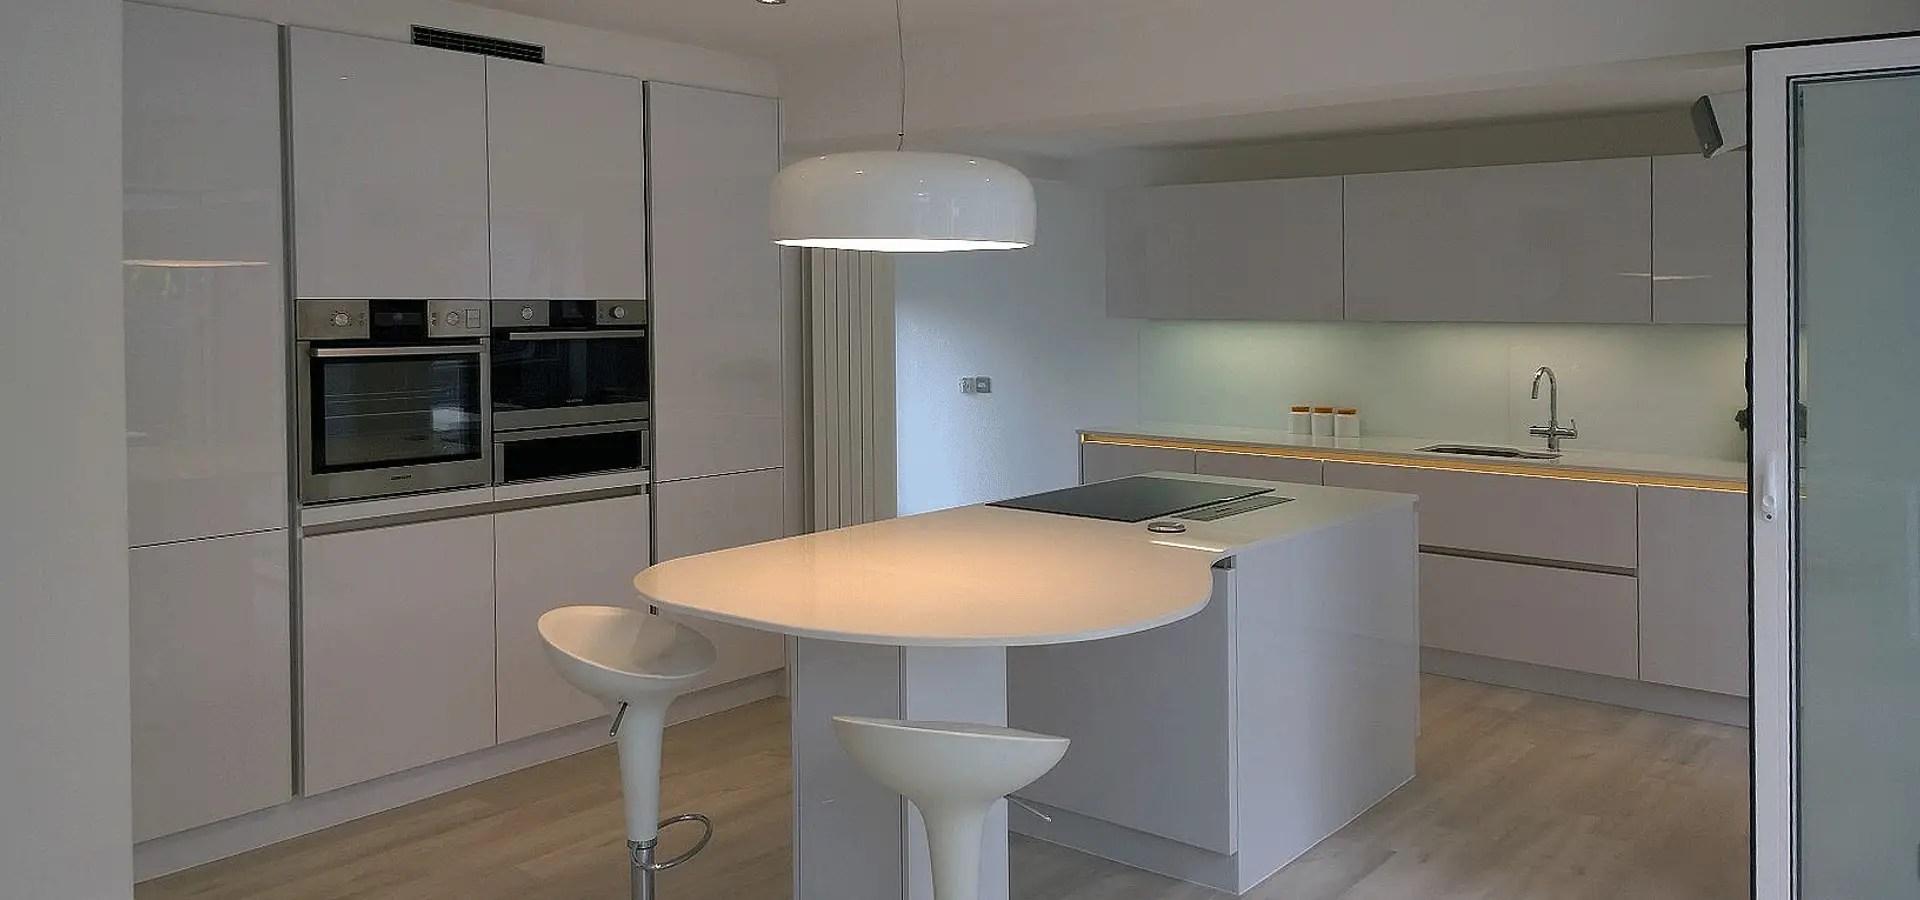 Think Kitchen and Bathroom Ltd Bathroom Designers in